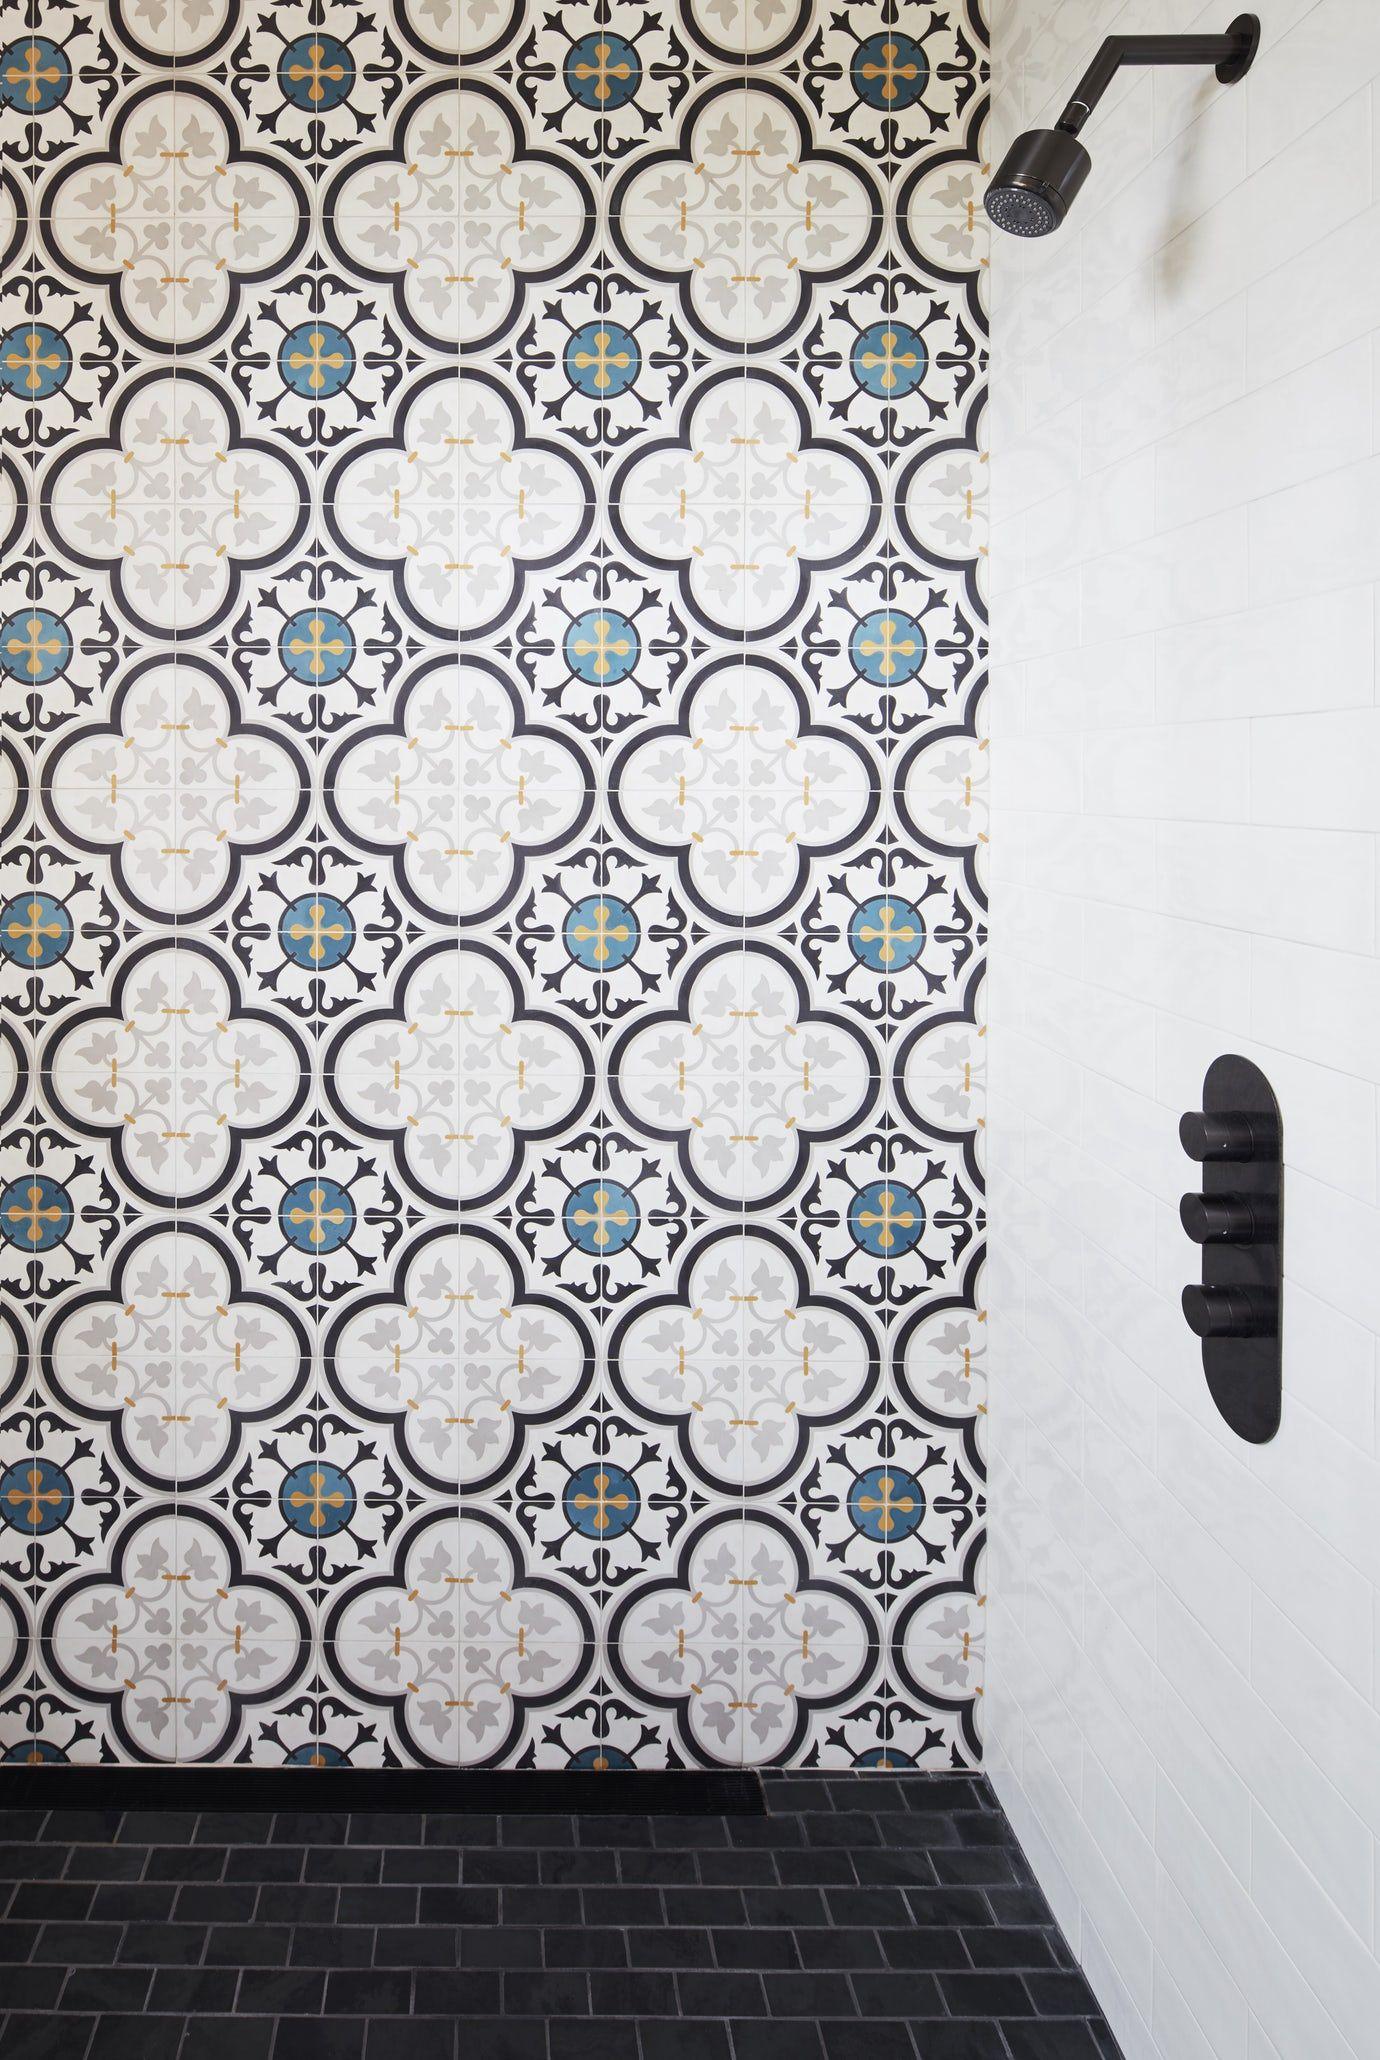 Awesome Tudor Floor Tiles Embellishment - Tile Texture Images ...